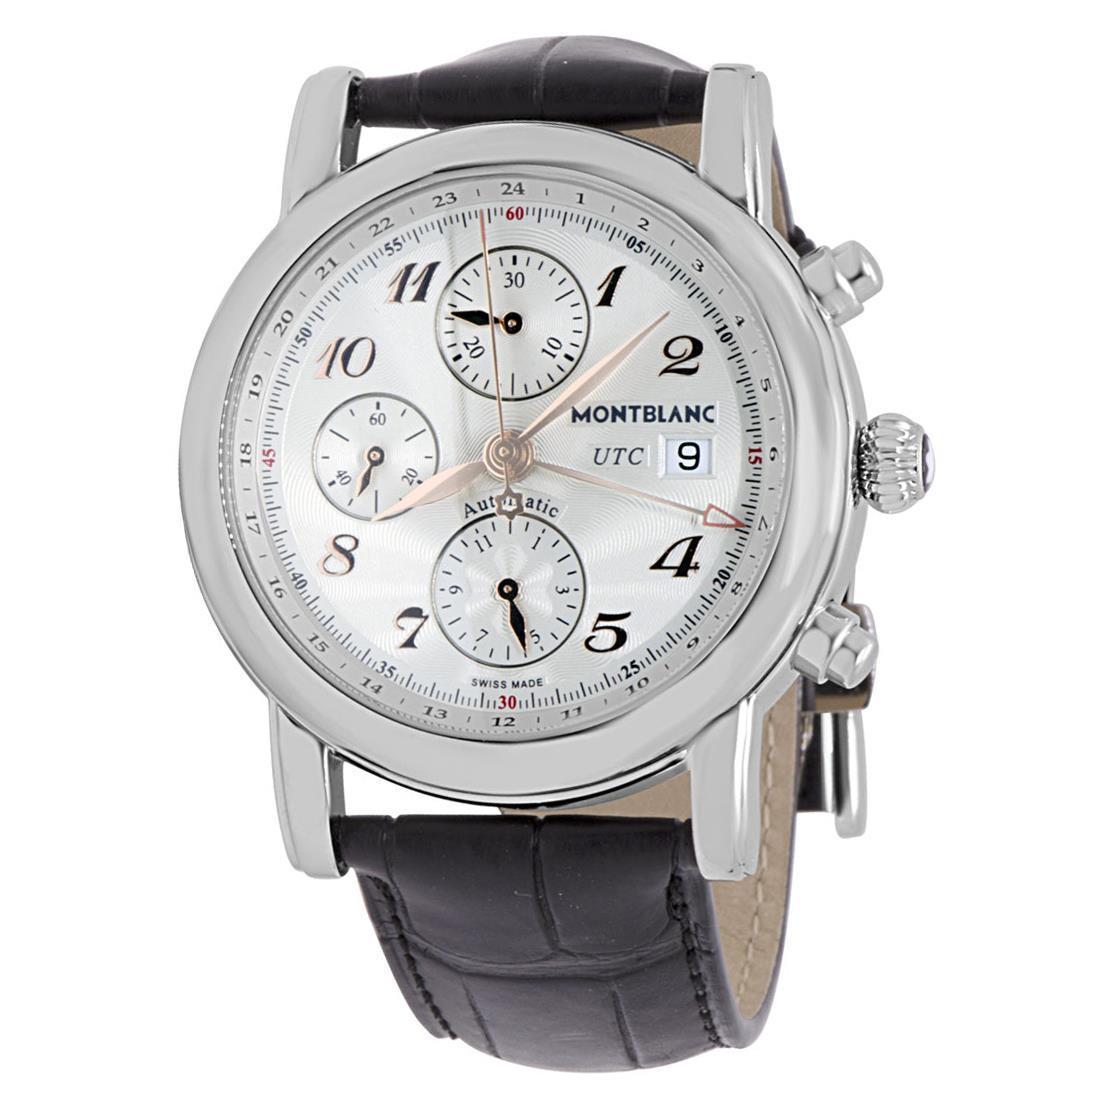 Orologio cronografo Star Chronograph UTC Automatic - MONTBLANC